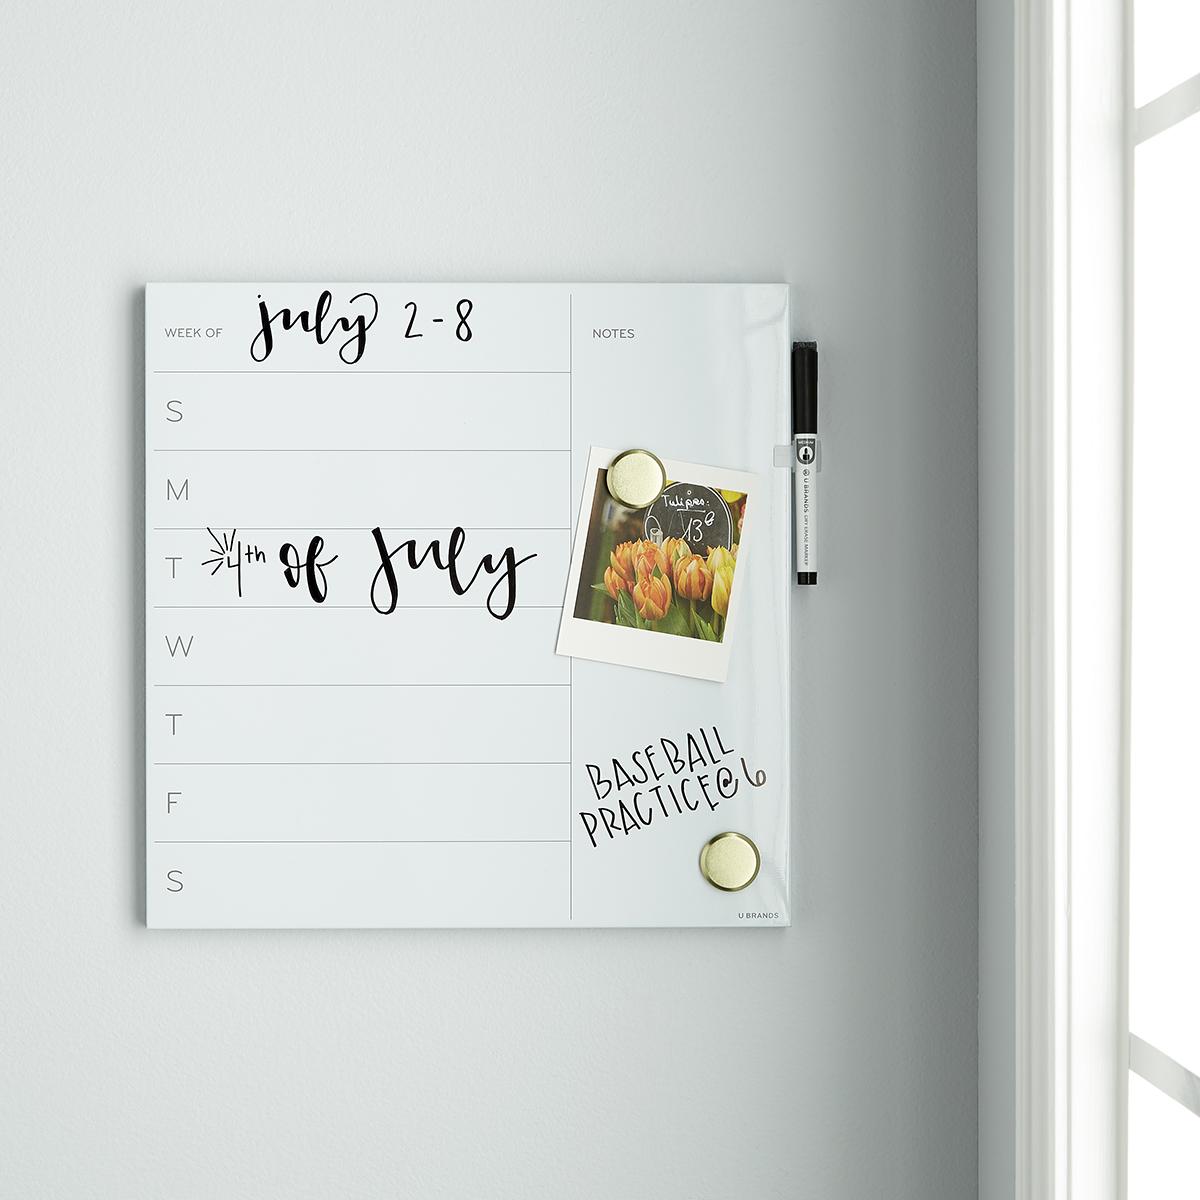 Bathroom Paneling Whiteboard 201x300.jpg U-Brands White Square Weekly Dry Erase Board ...